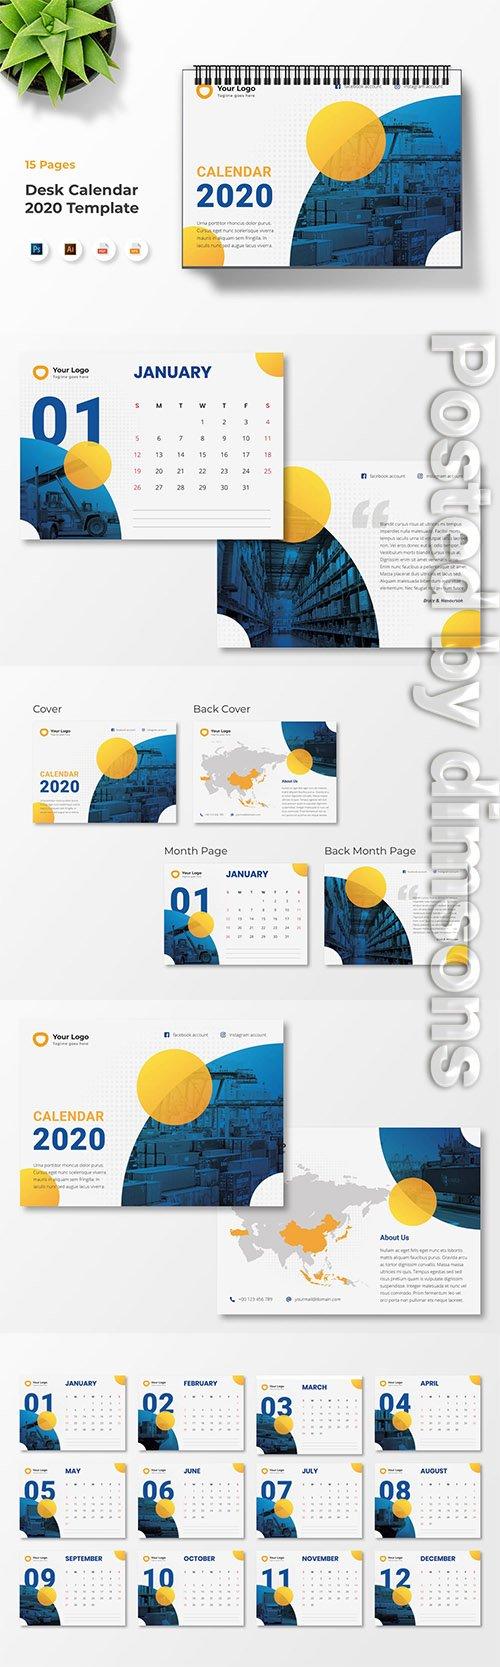 Calendar 2020 PSD